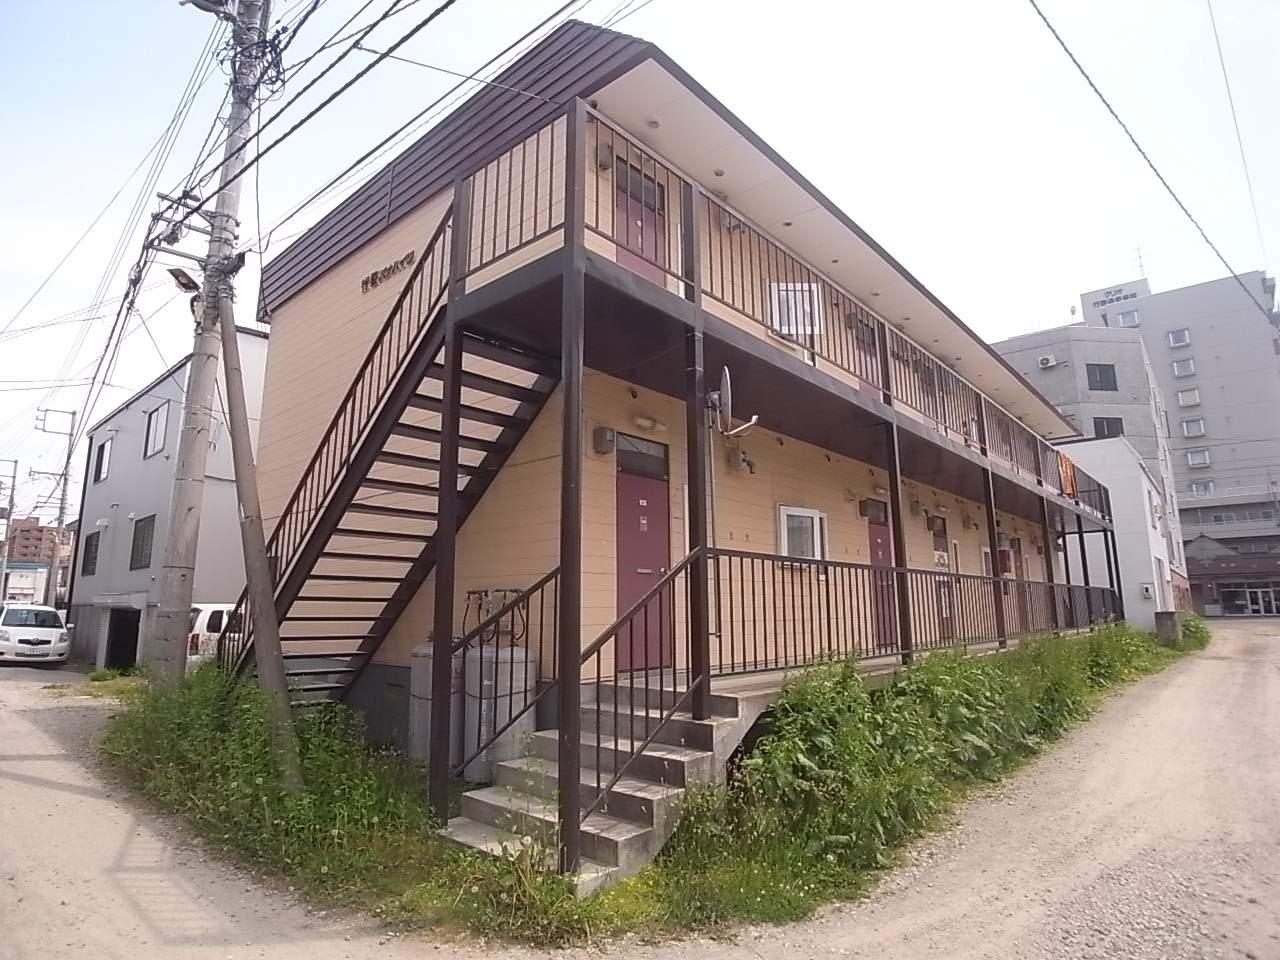 北海道札幌市中央区、中島公園駅徒歩16分の築35年 2階建の賃貸アパート